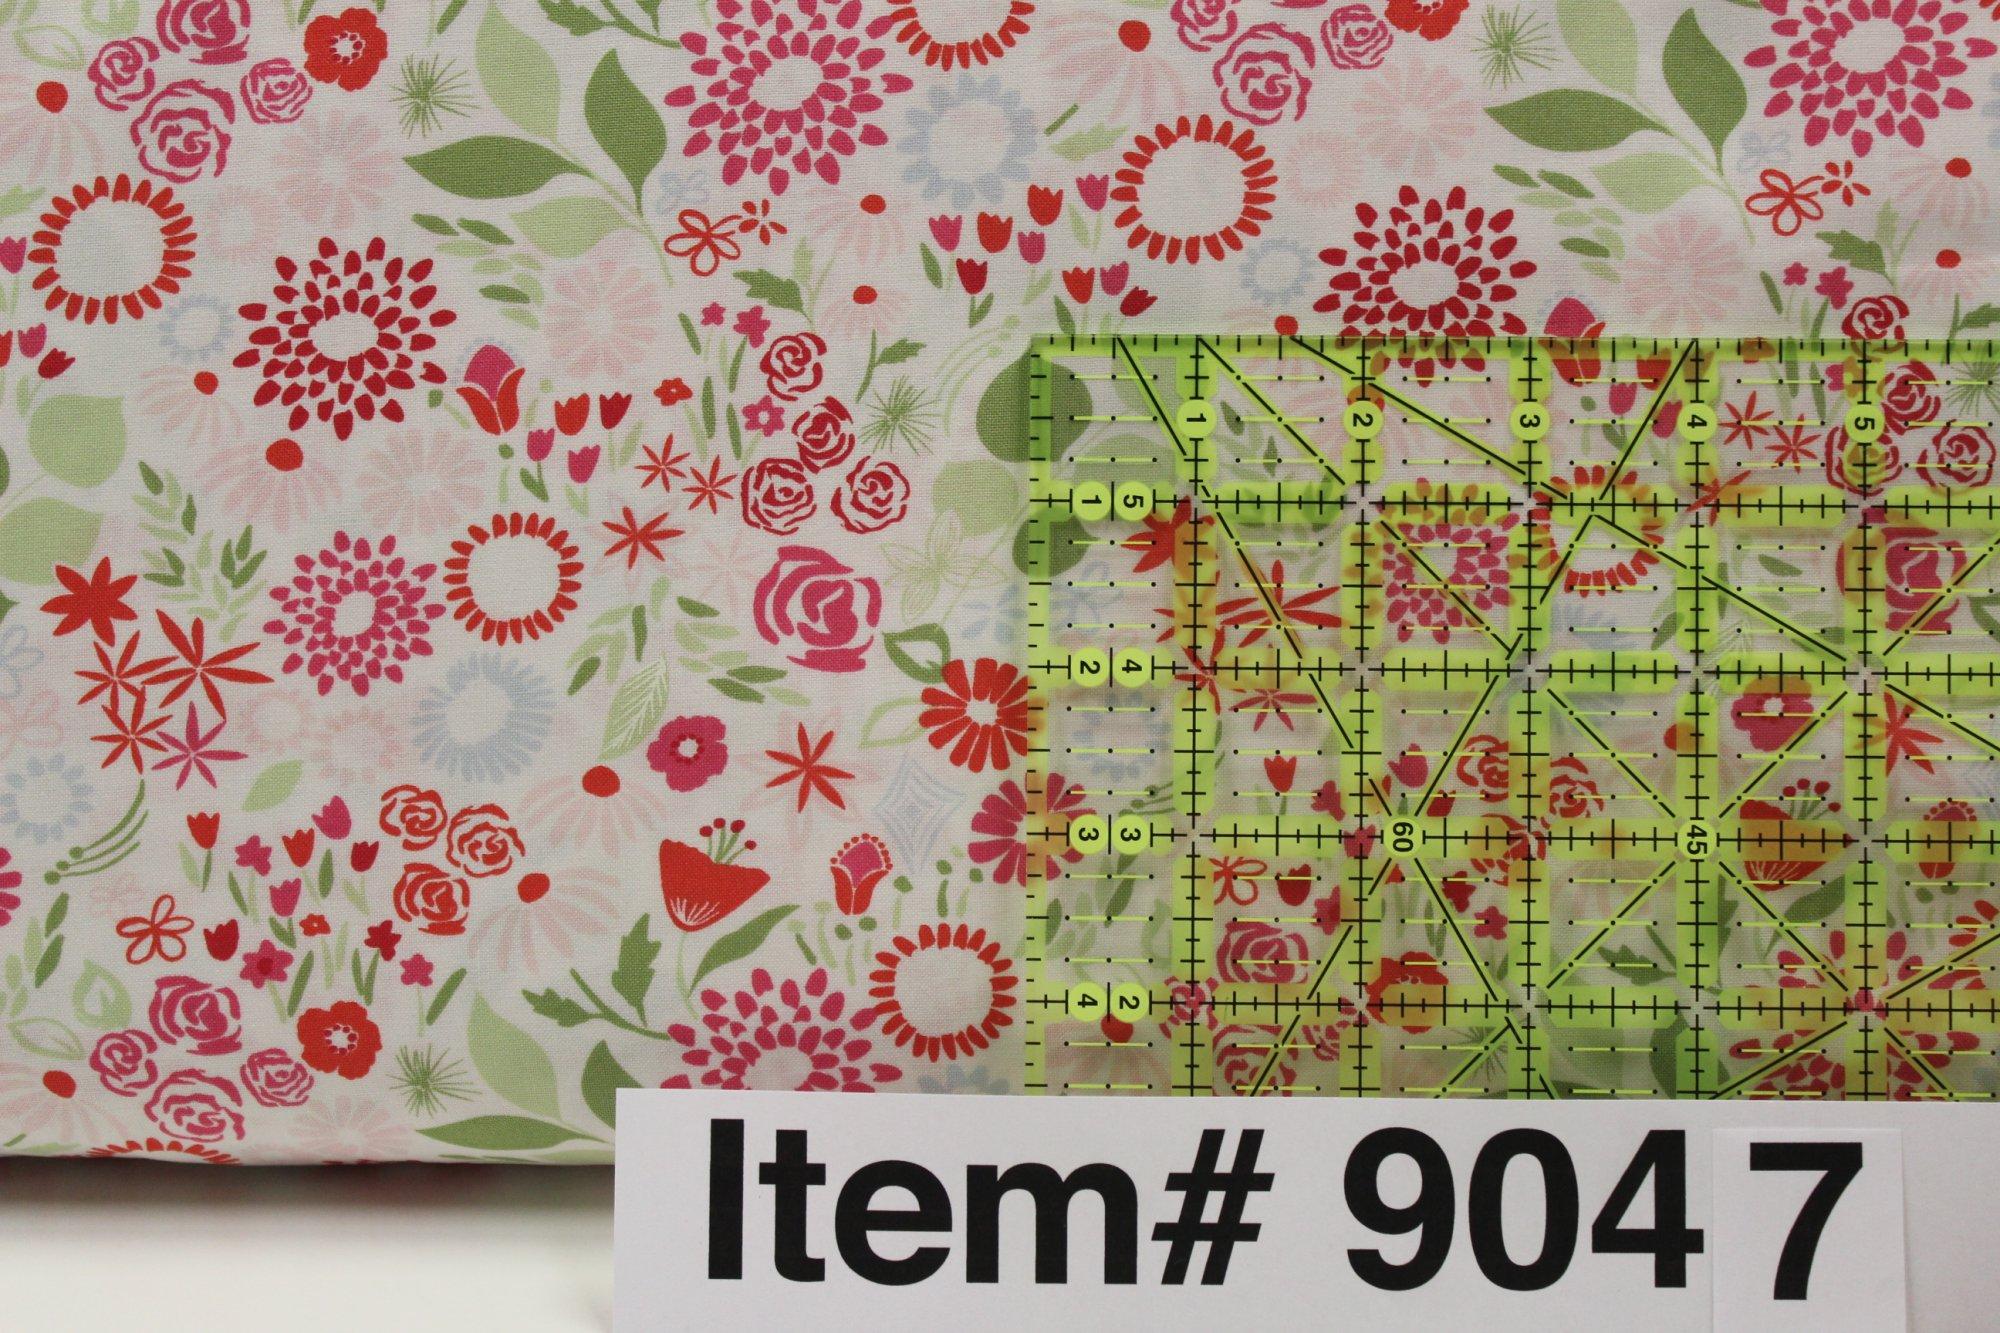 Item#9047 - Aria Mariposa Multi Begonia - Moda - Kate Spain - Bolt# 9047